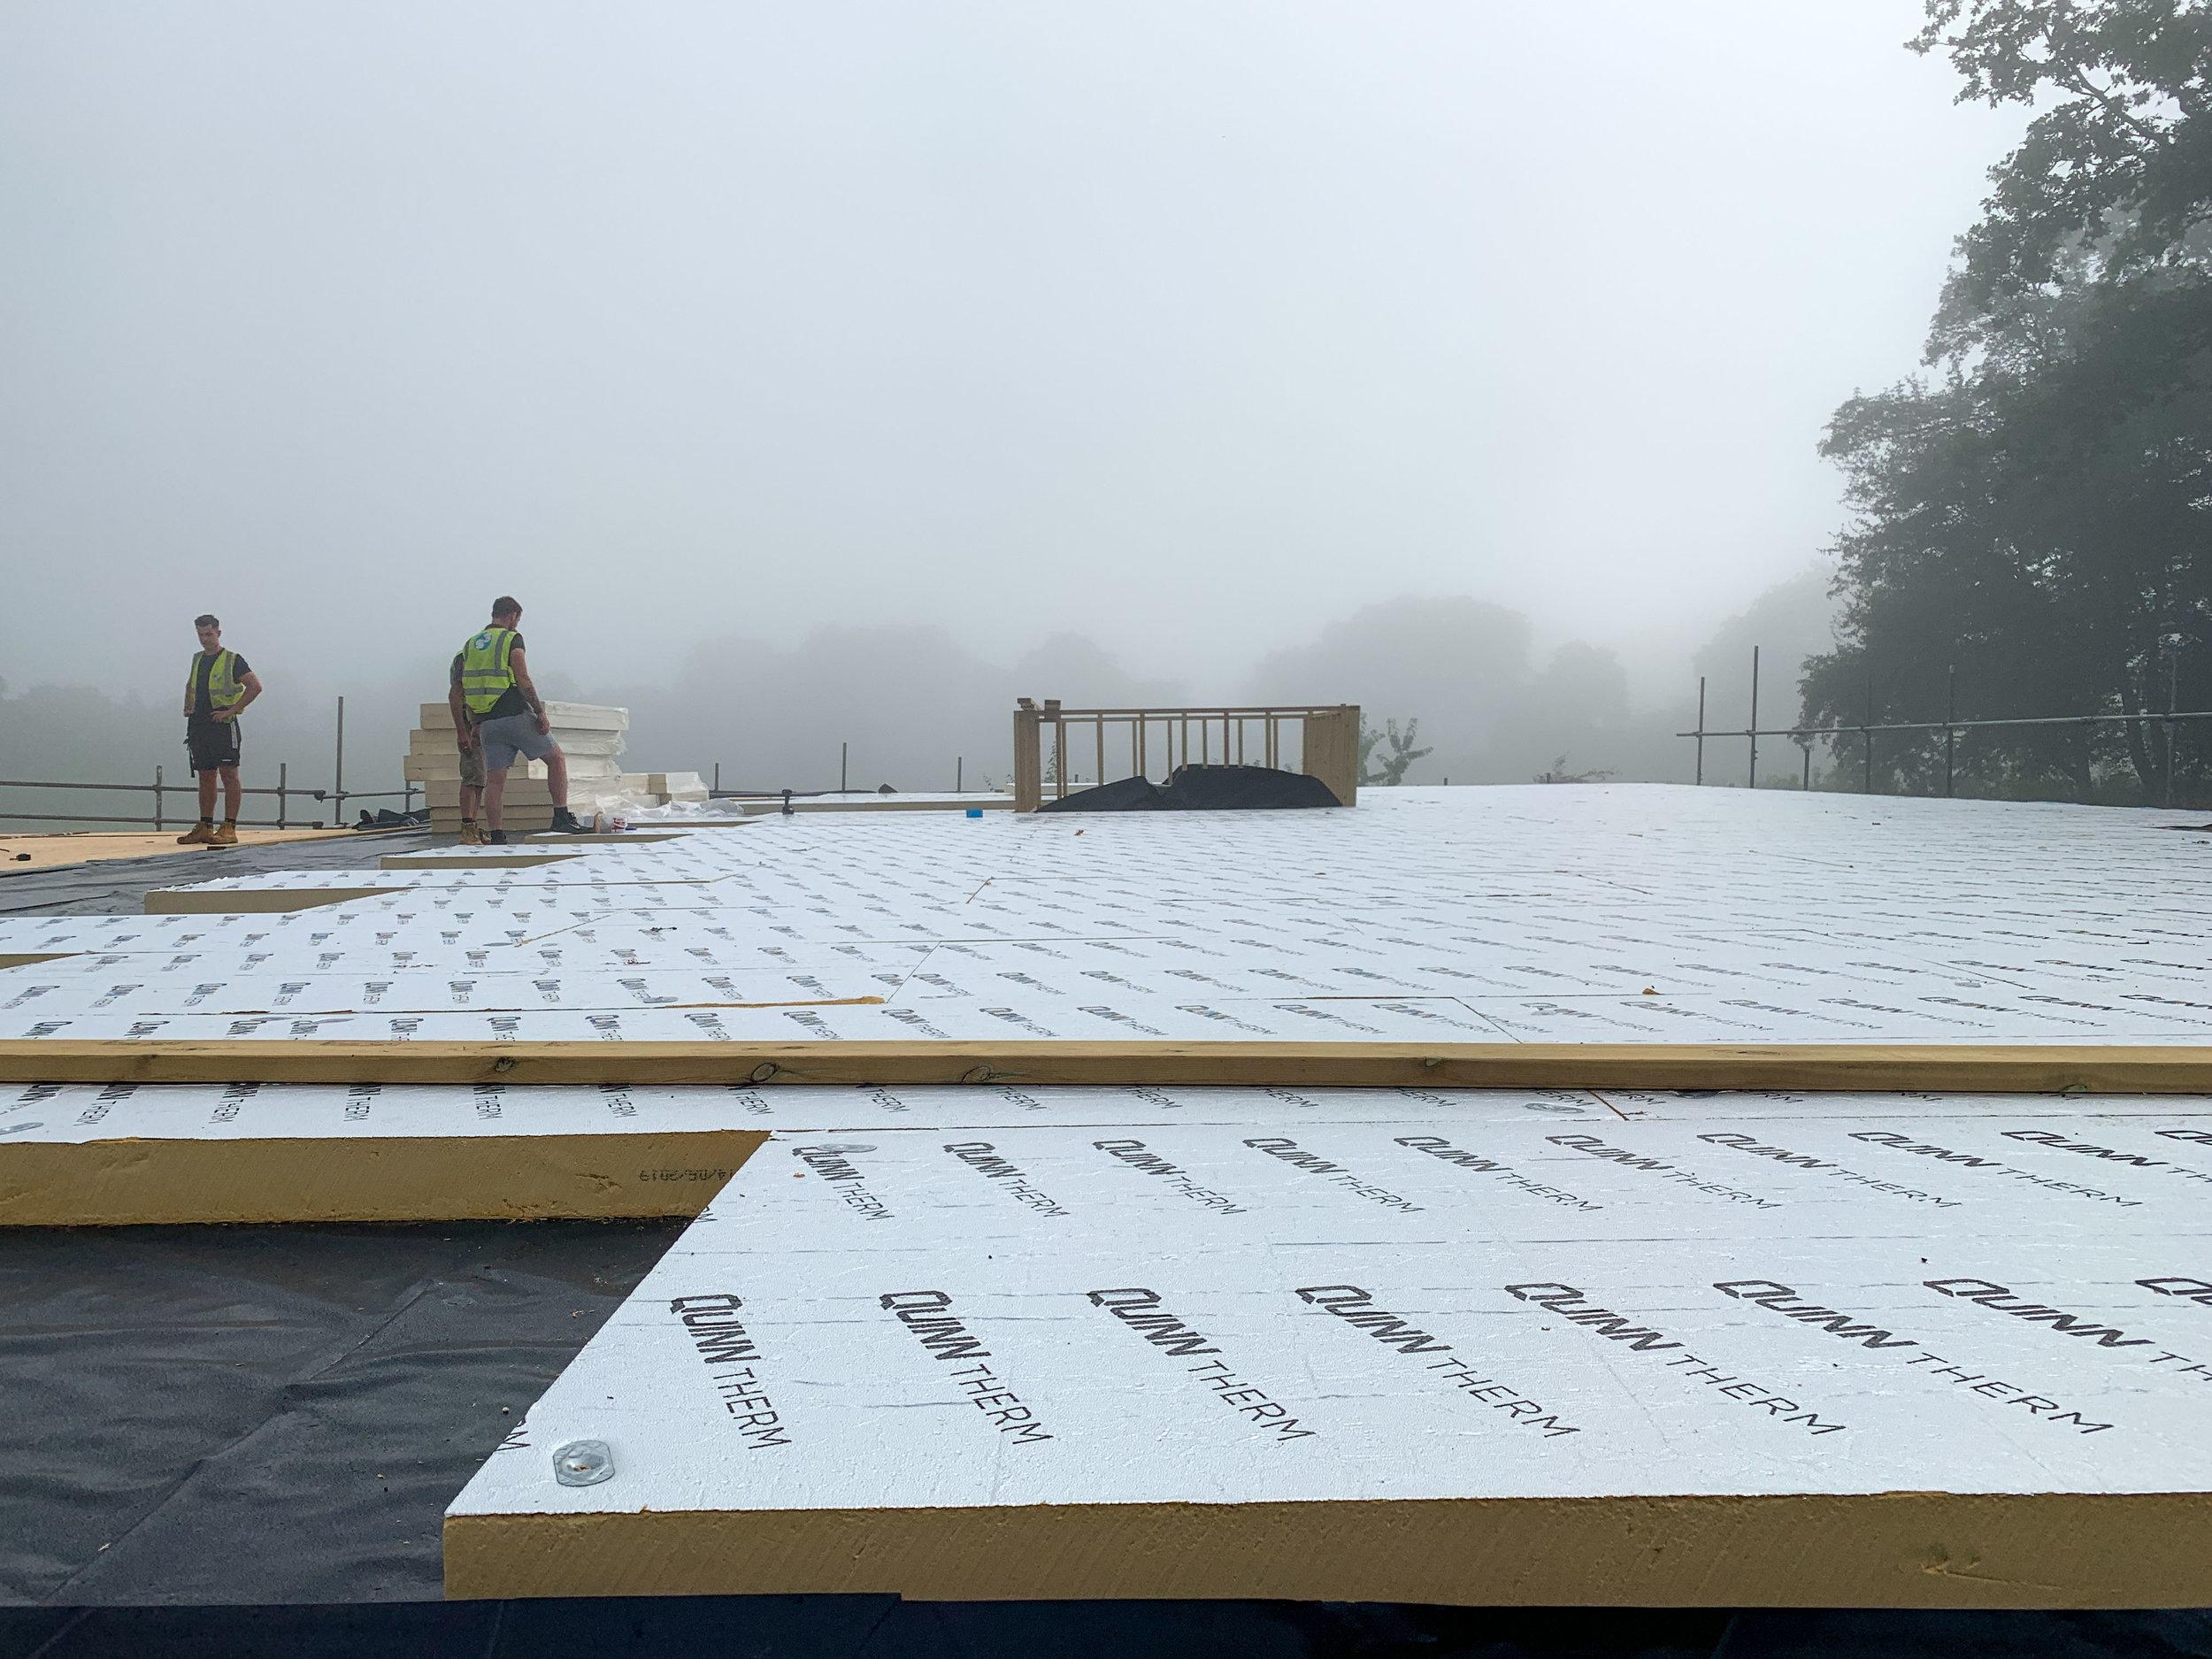 Refreshing morning mist on site